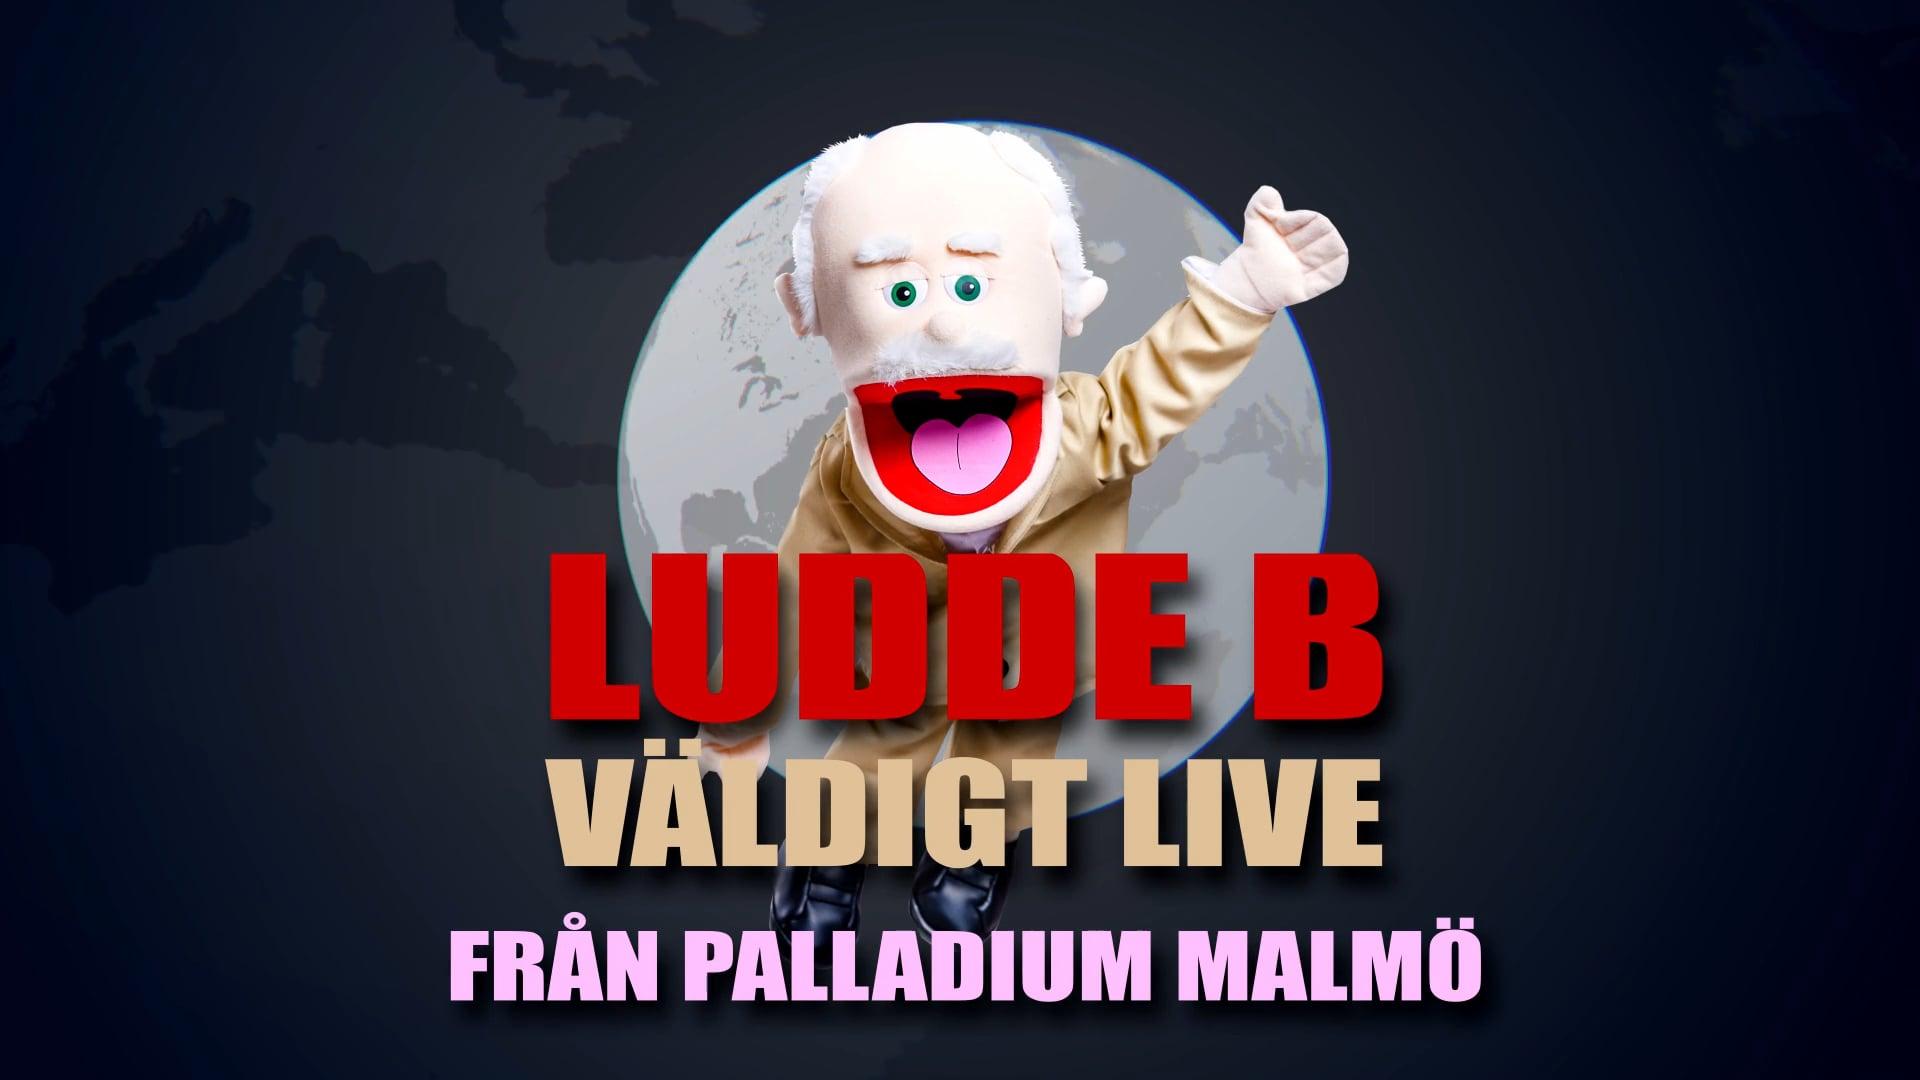 luddeb_trailer.mov